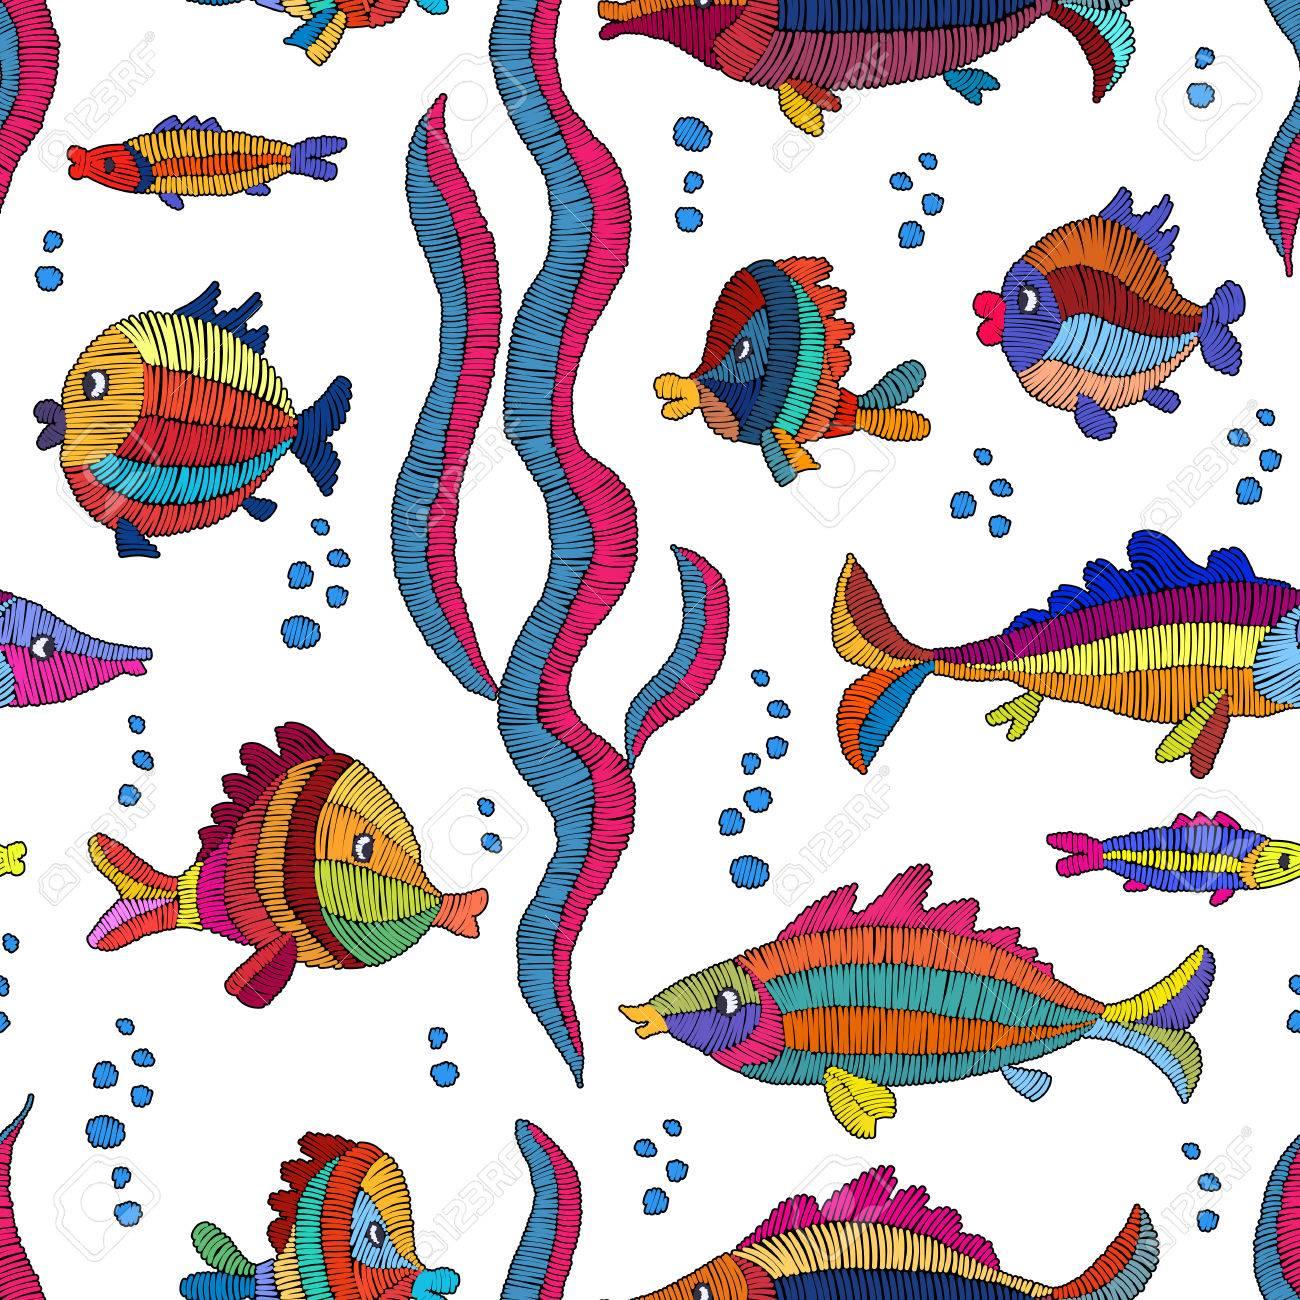 Pescado Bordado De Dibujos Animados Sobre Un Fondo Blanco - Patrón ...